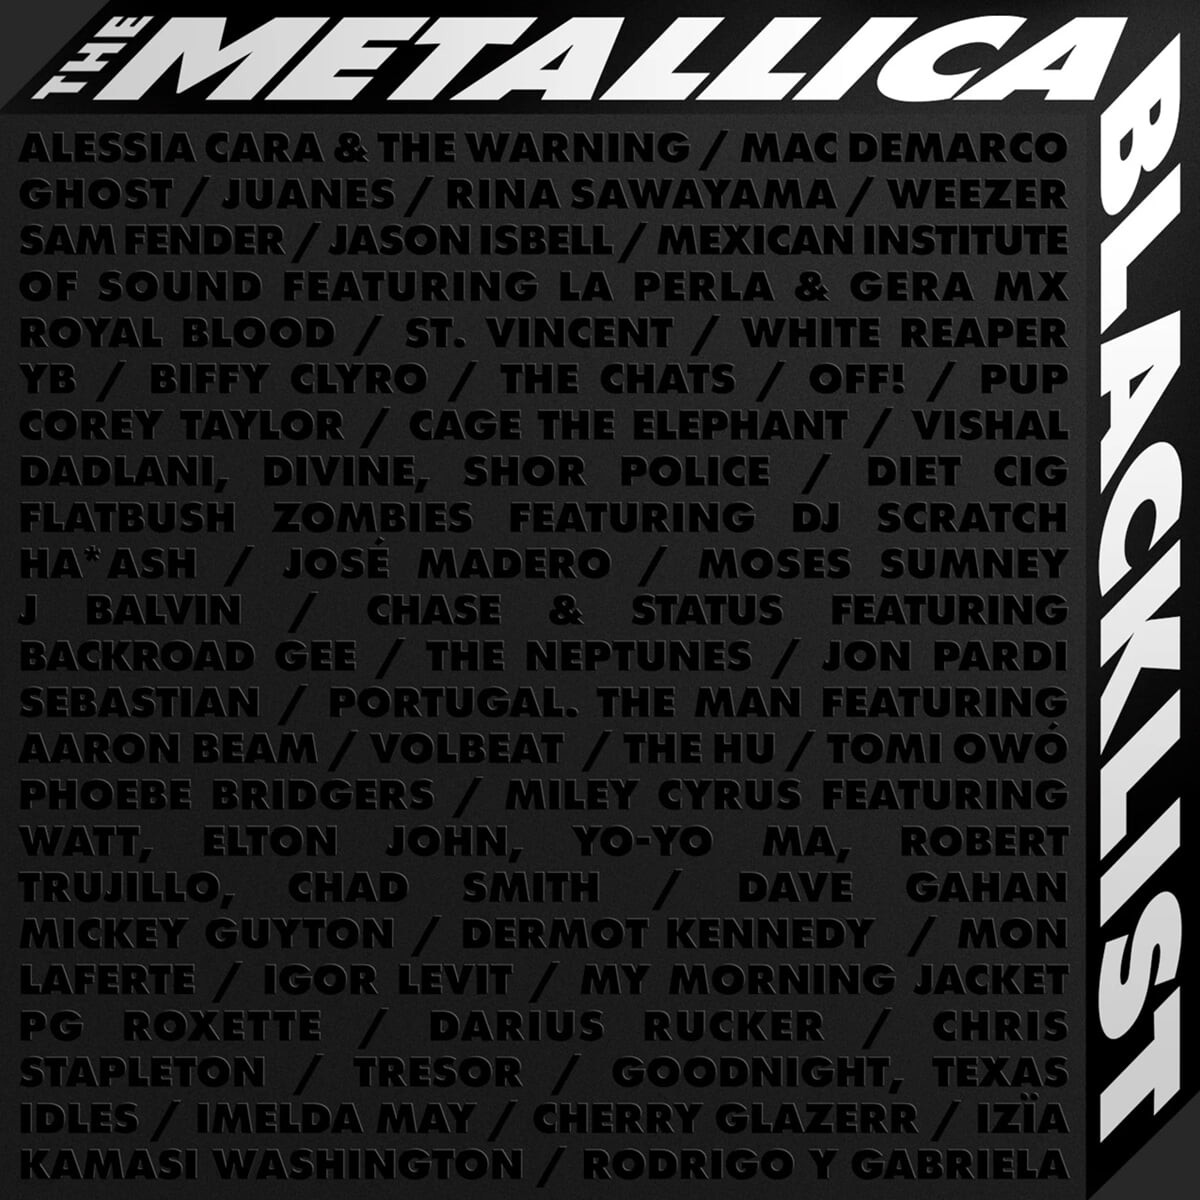 Metallica (메탈리카) - 발매 30주년 기념 프로젝트 앨범 The Metallica Blacklist